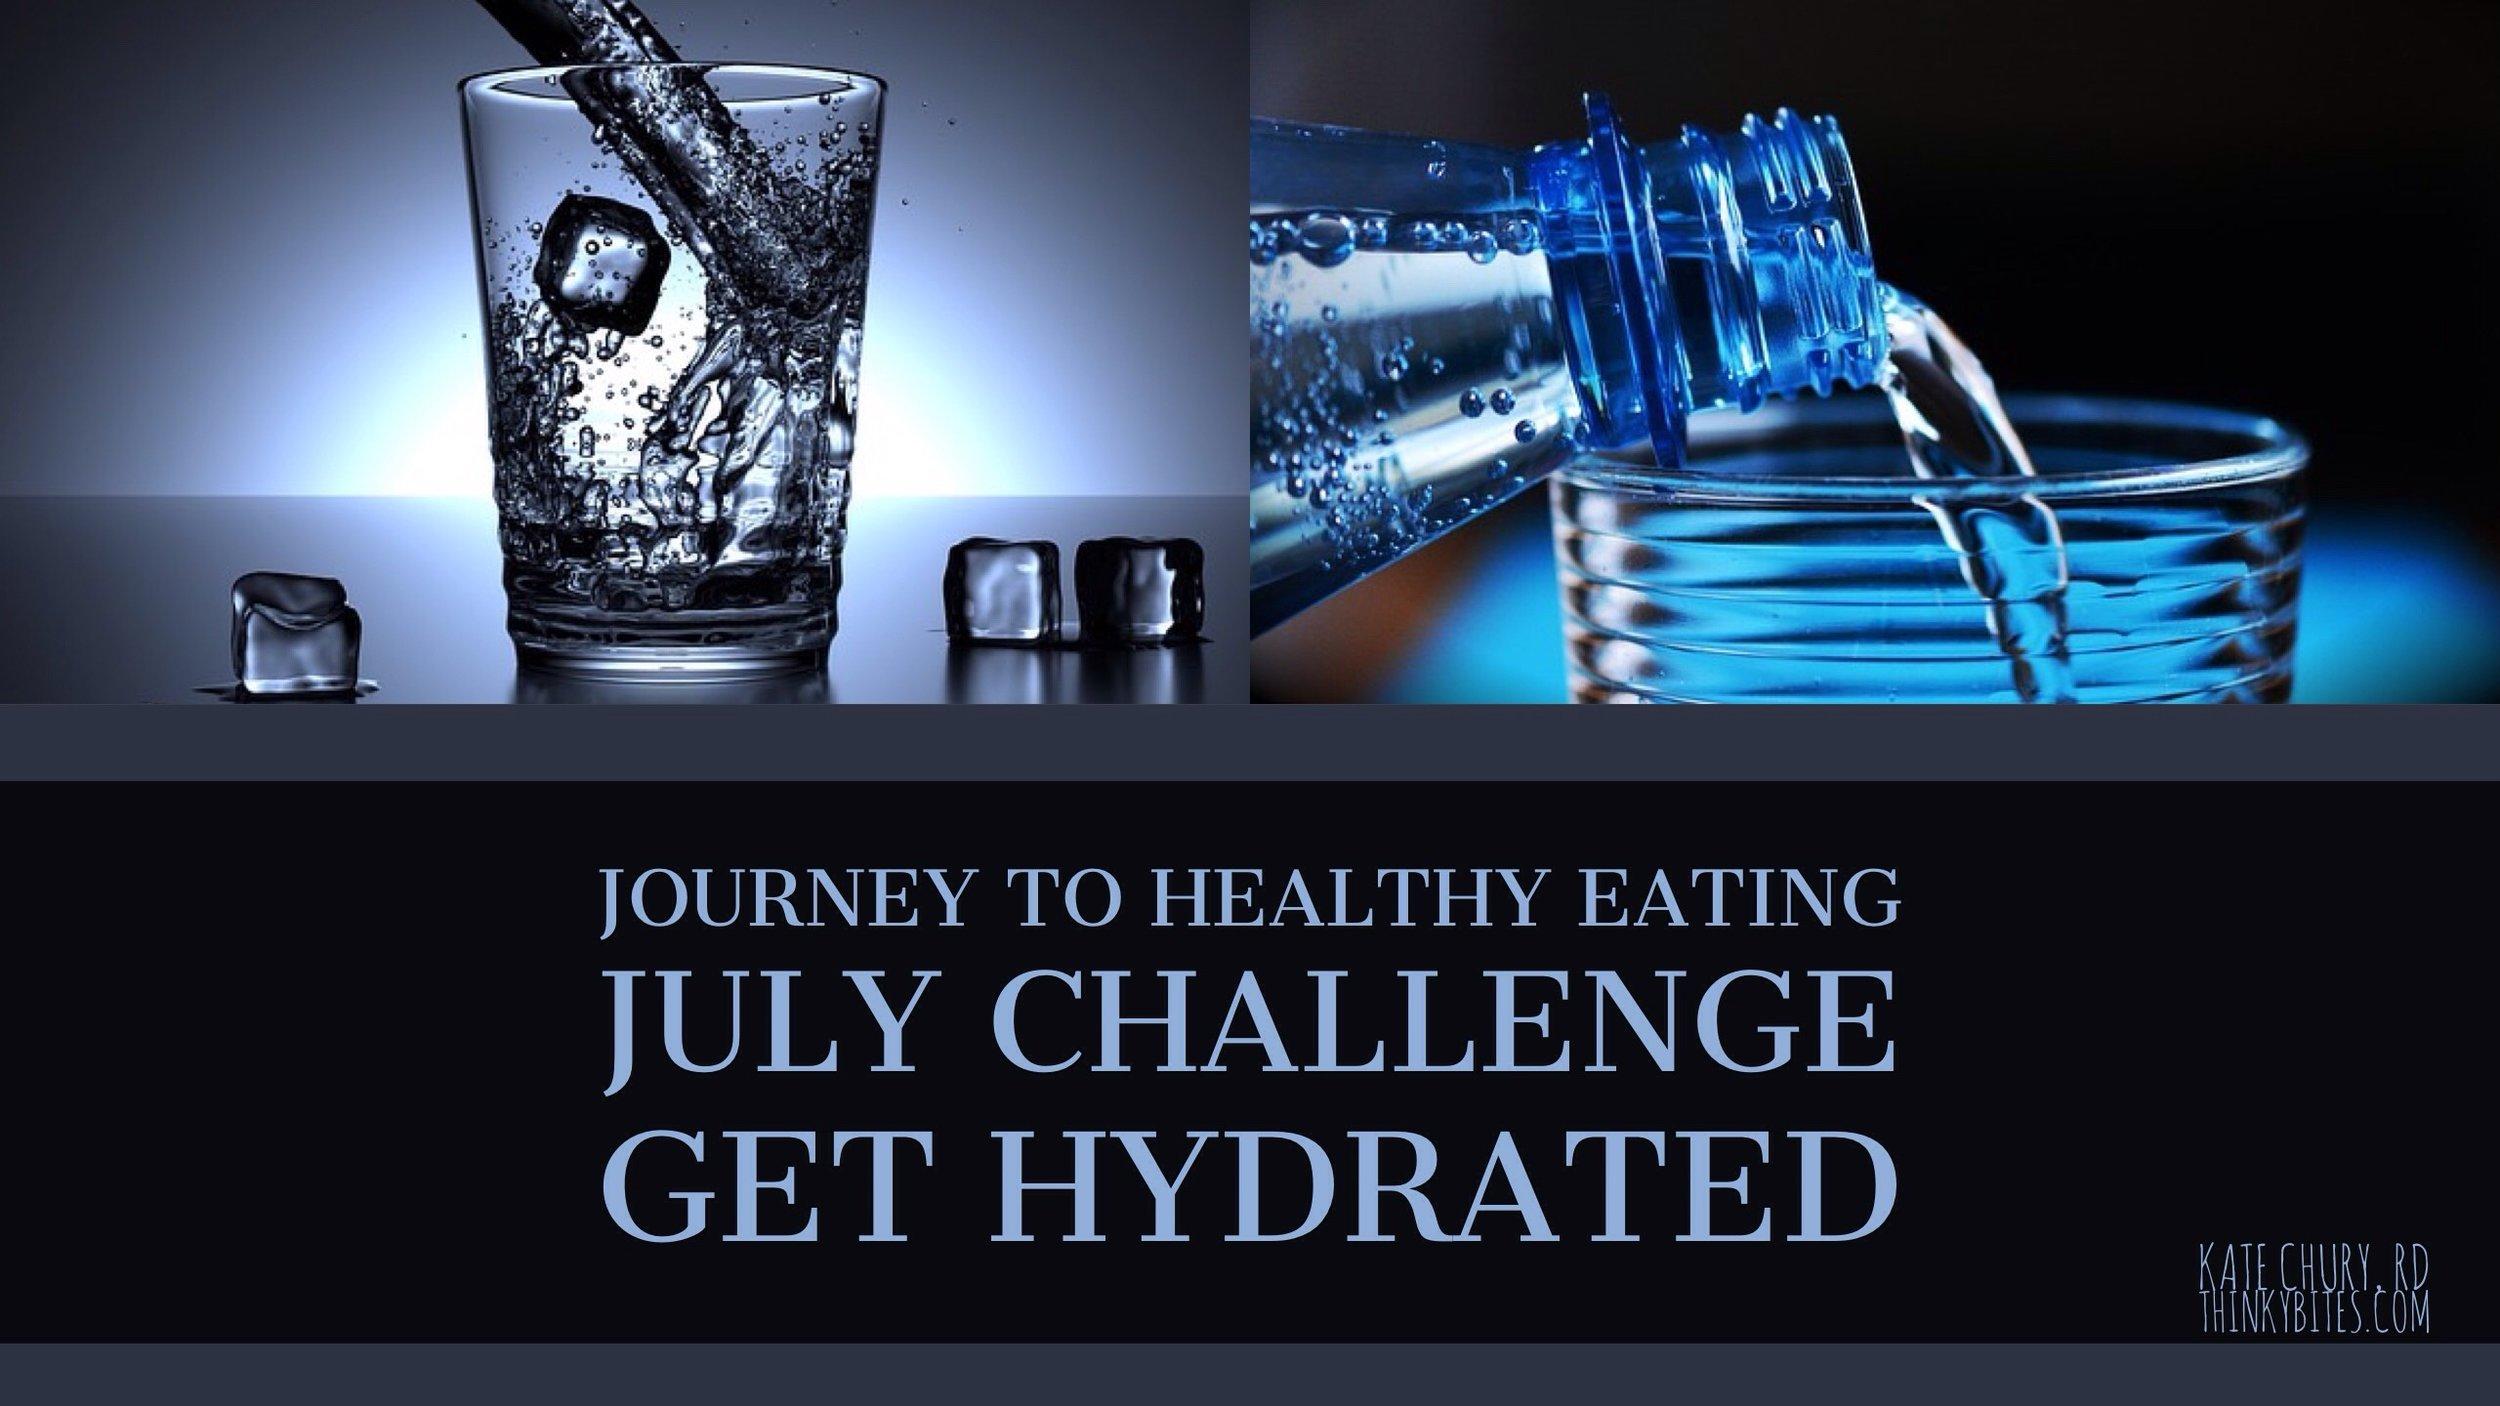 Kate Chury RD Dietitian Calgary Water